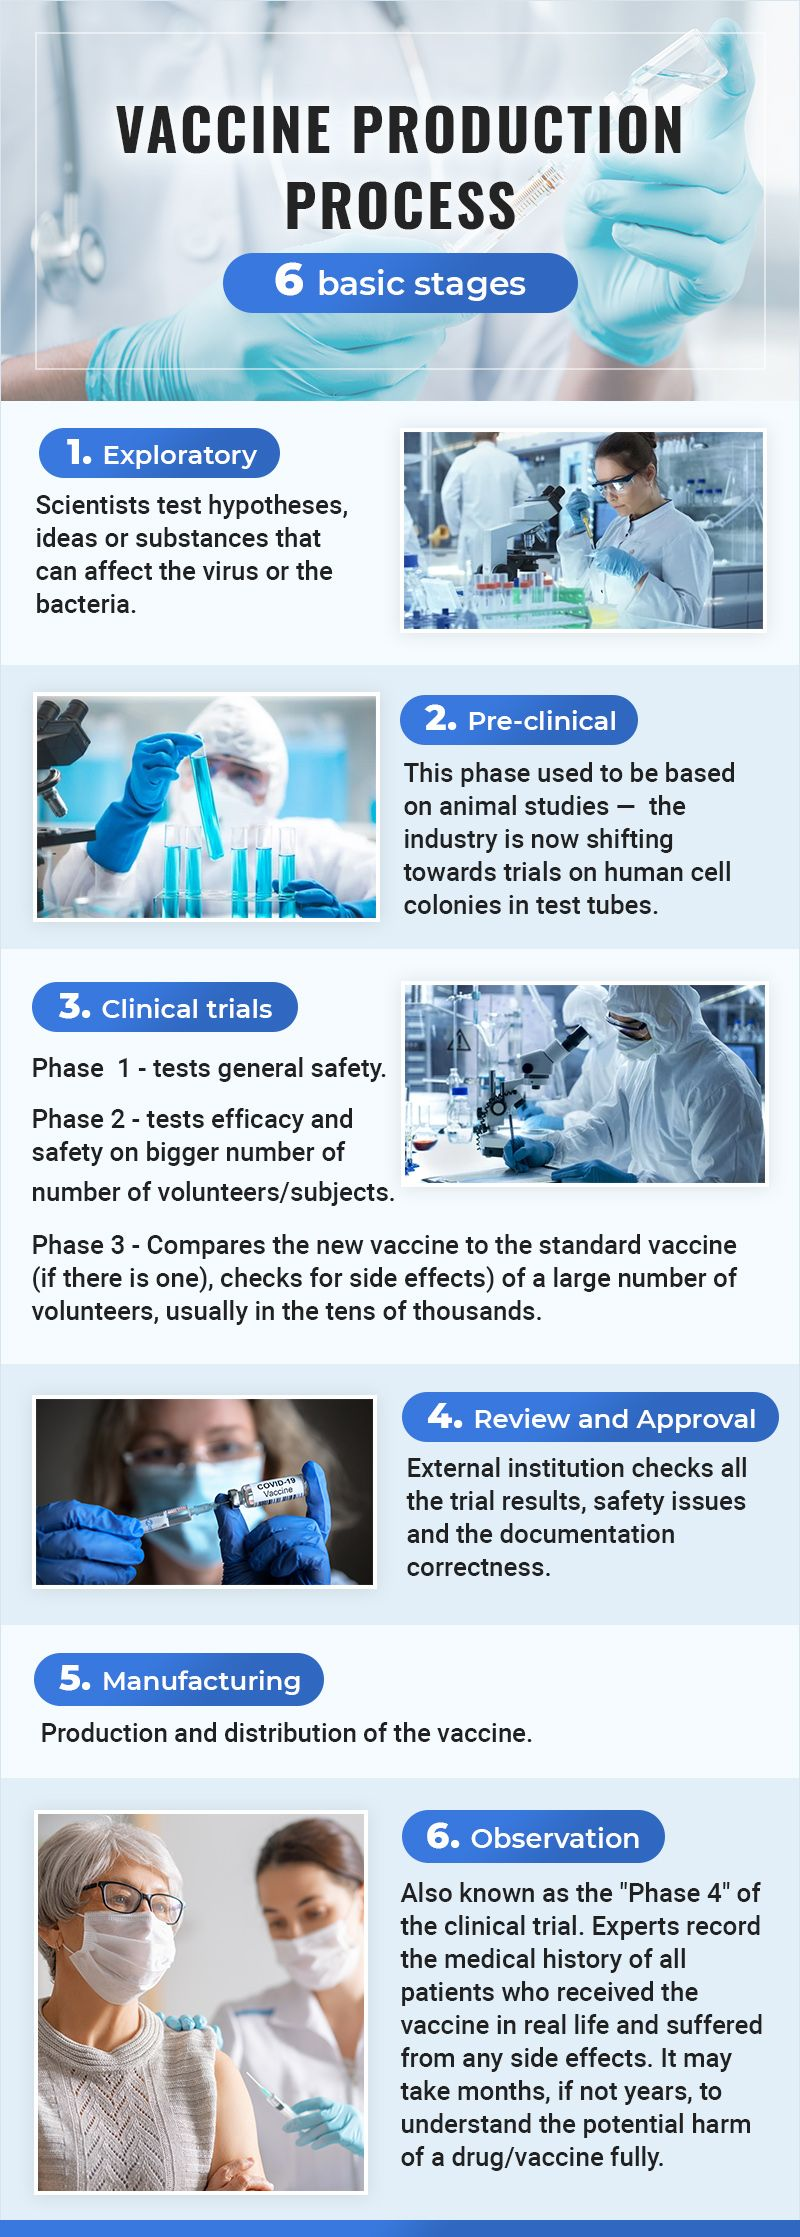 Vaccine production process 01